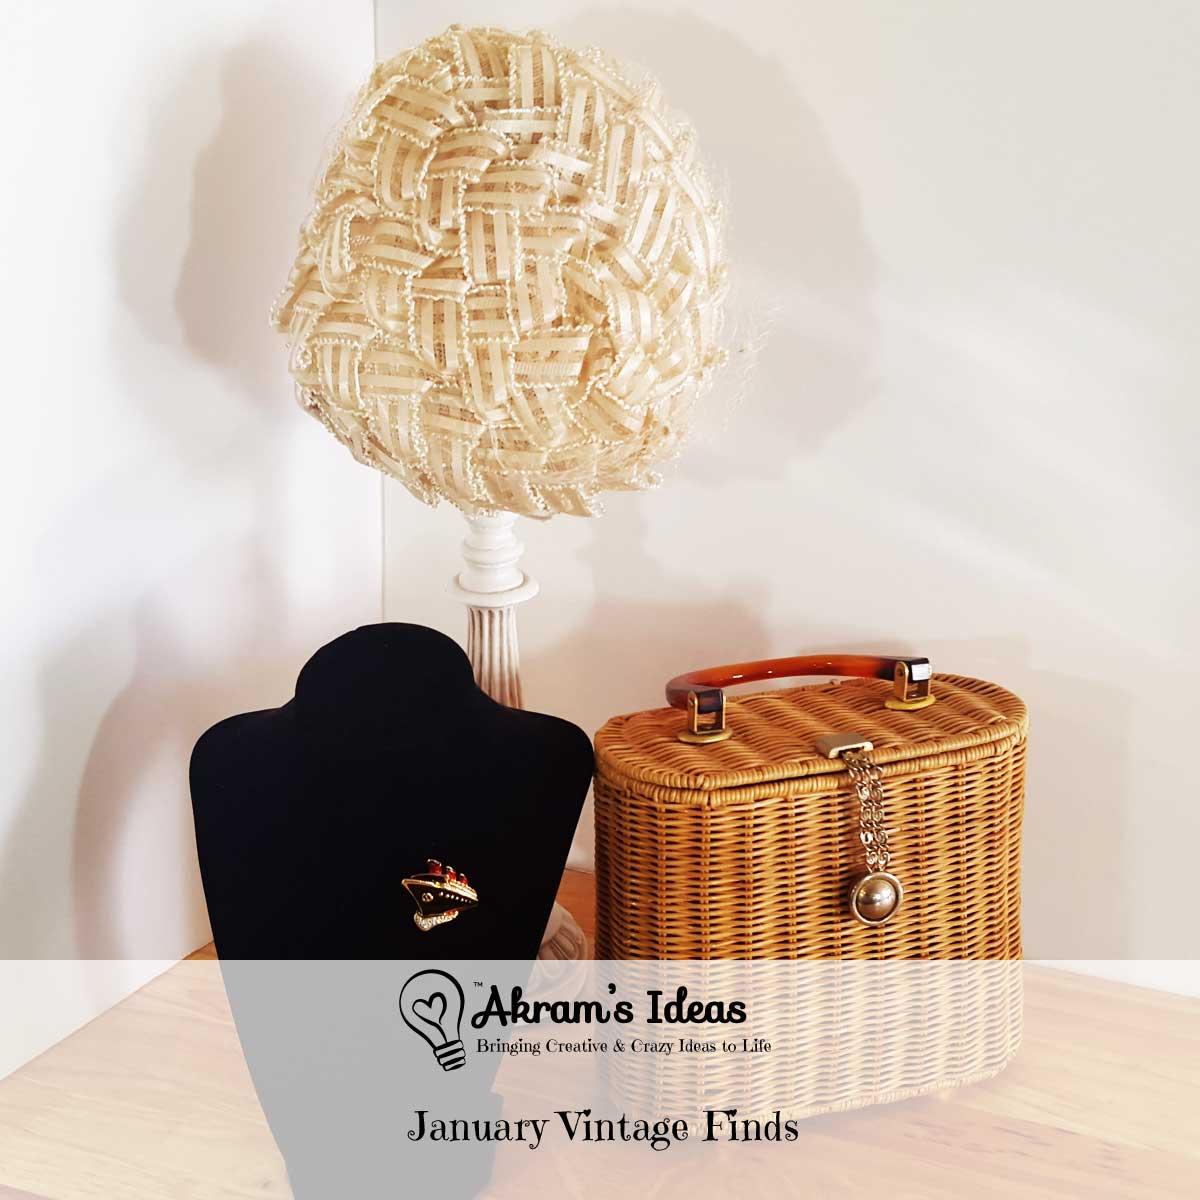 Akram's Ideas: January Vintage Finds